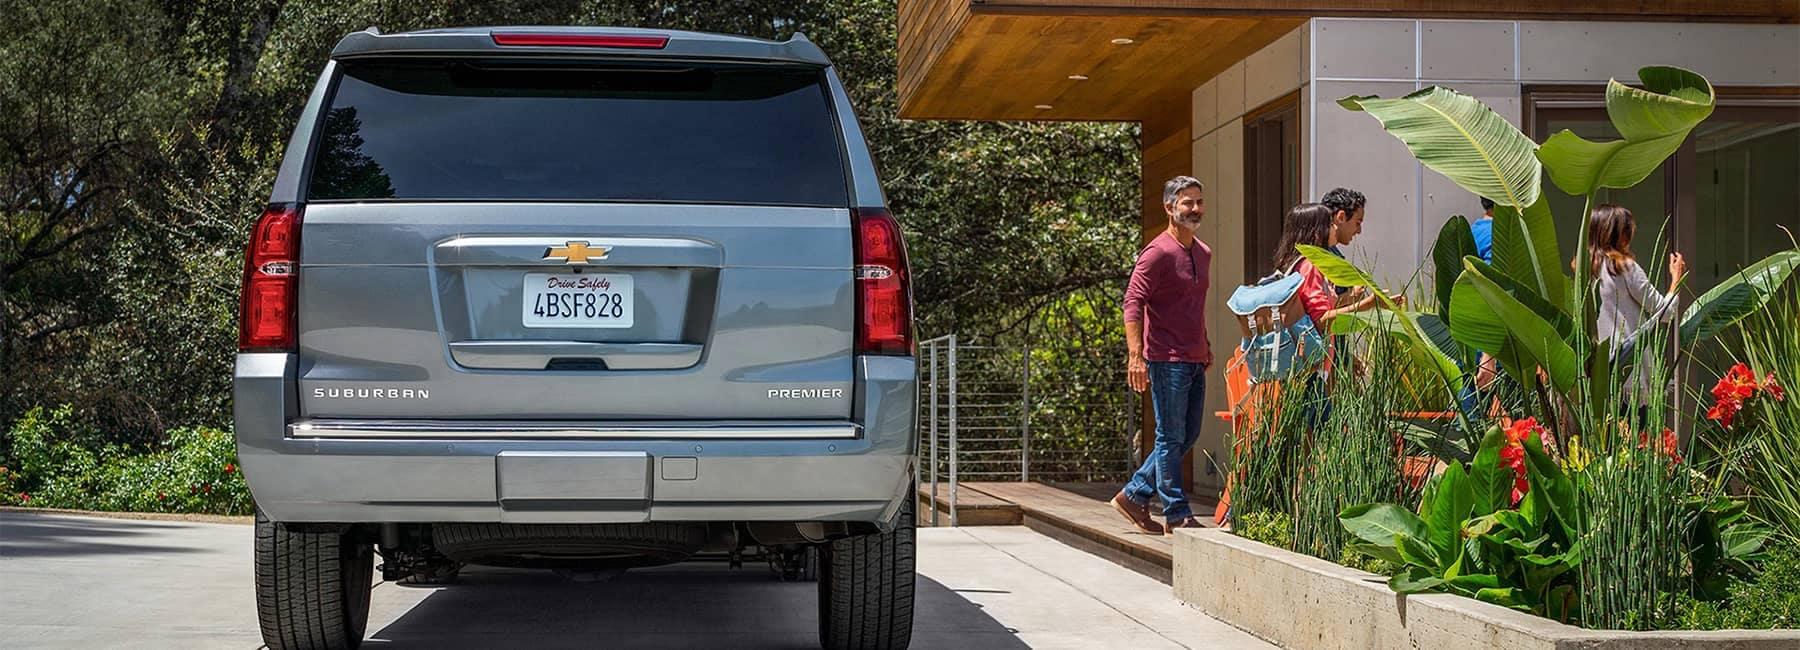 2020 Suburban Large SUV Rear View